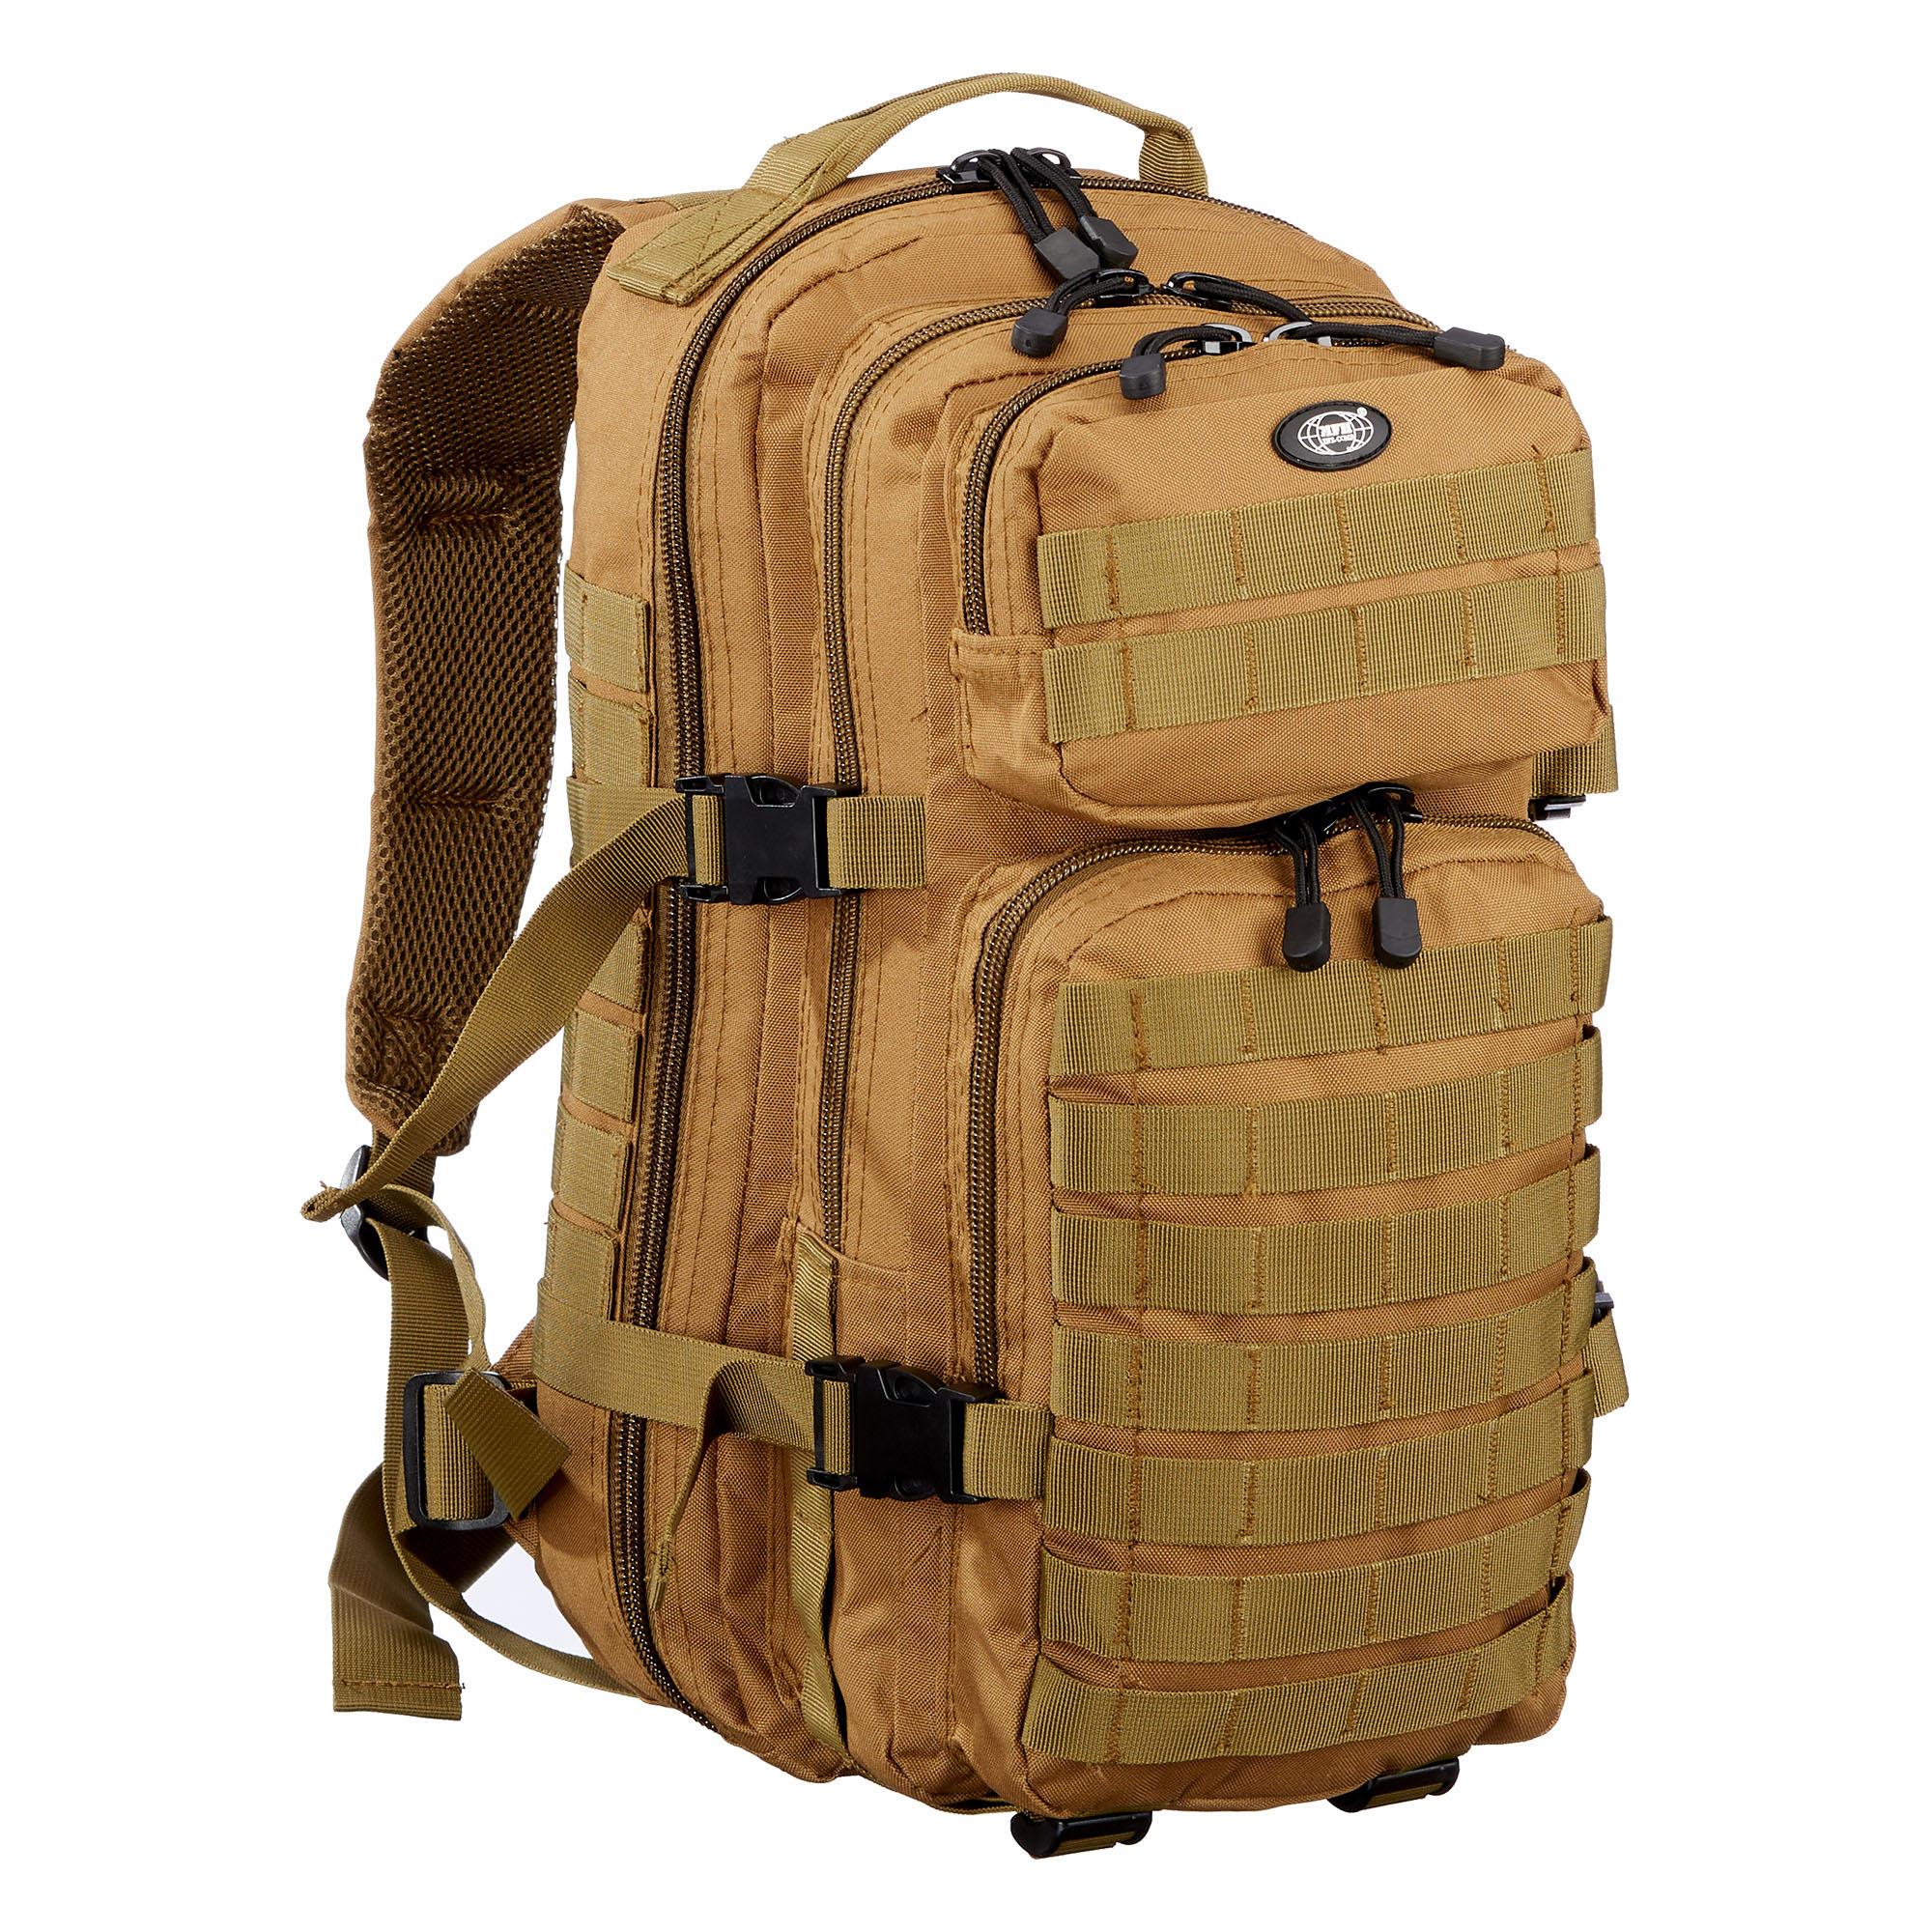 MFH Rucksack US Assault Pack coyote